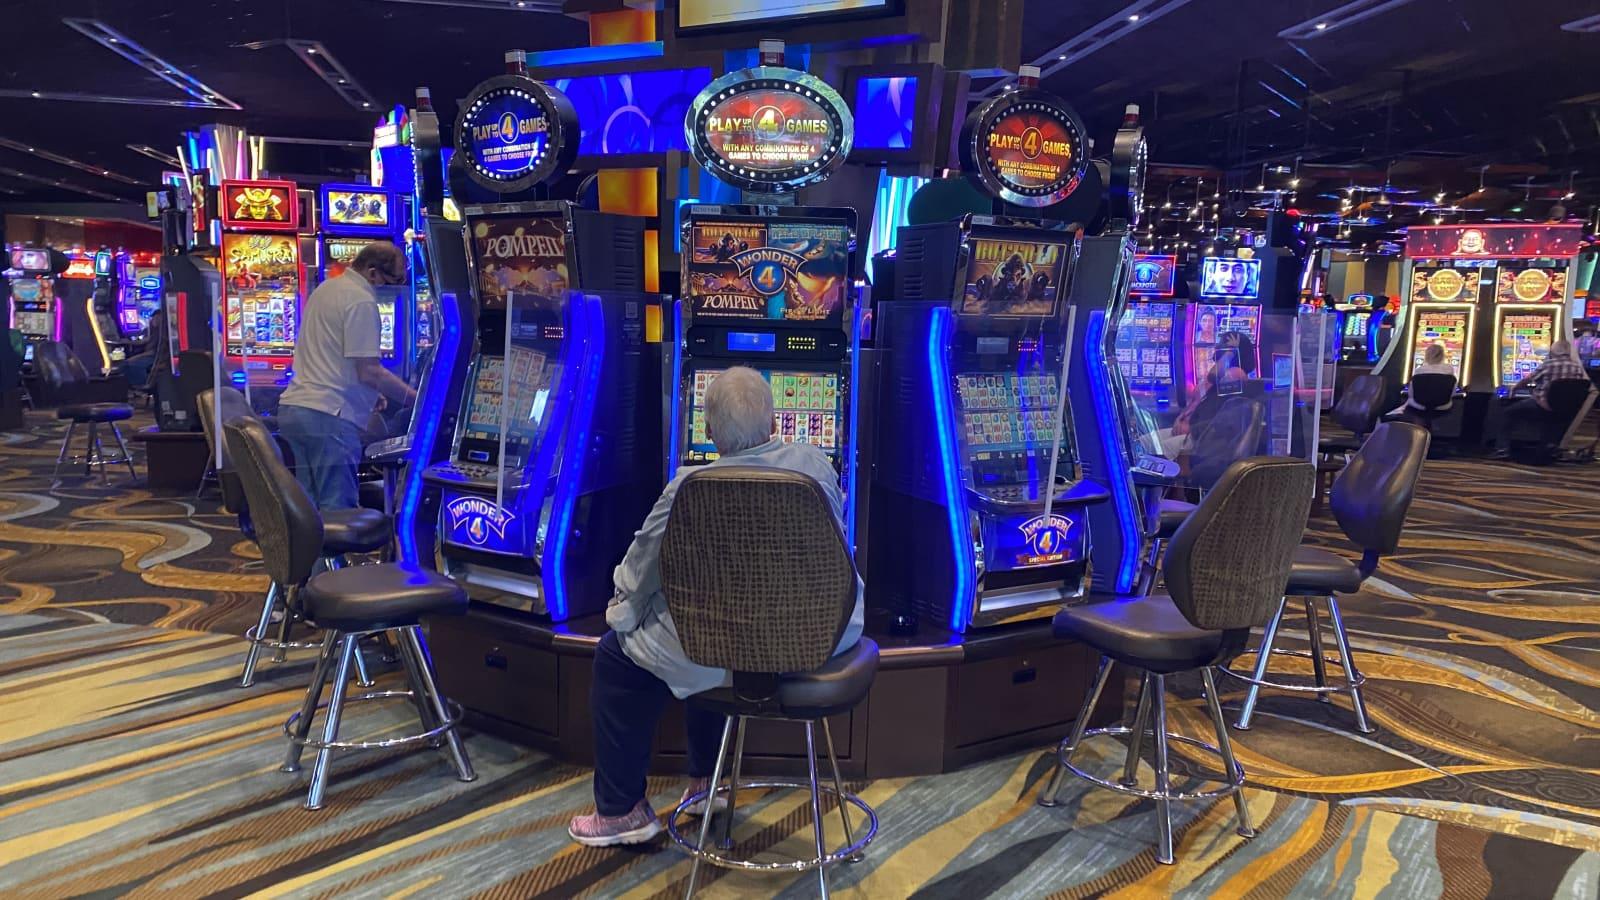 Centruy gaming casino the biggest casino in usa